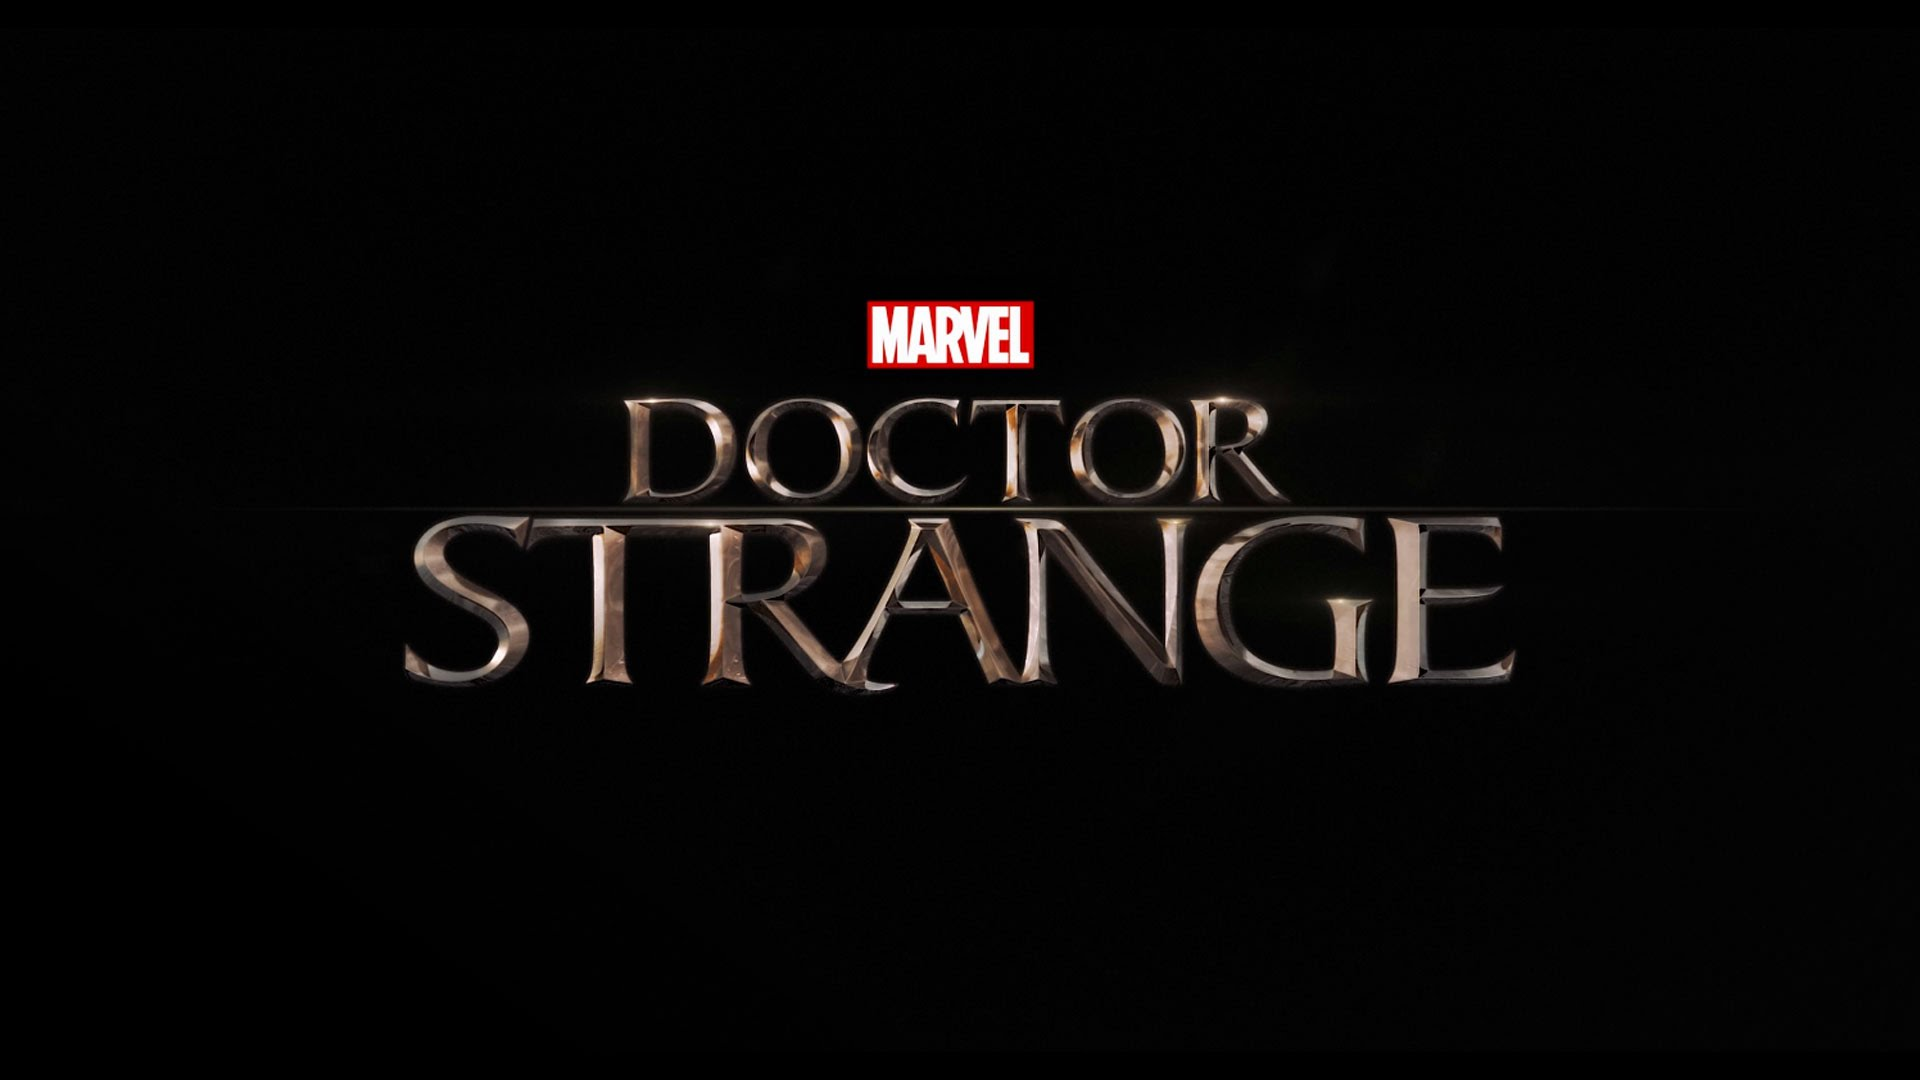 Doctor Strange Pictures